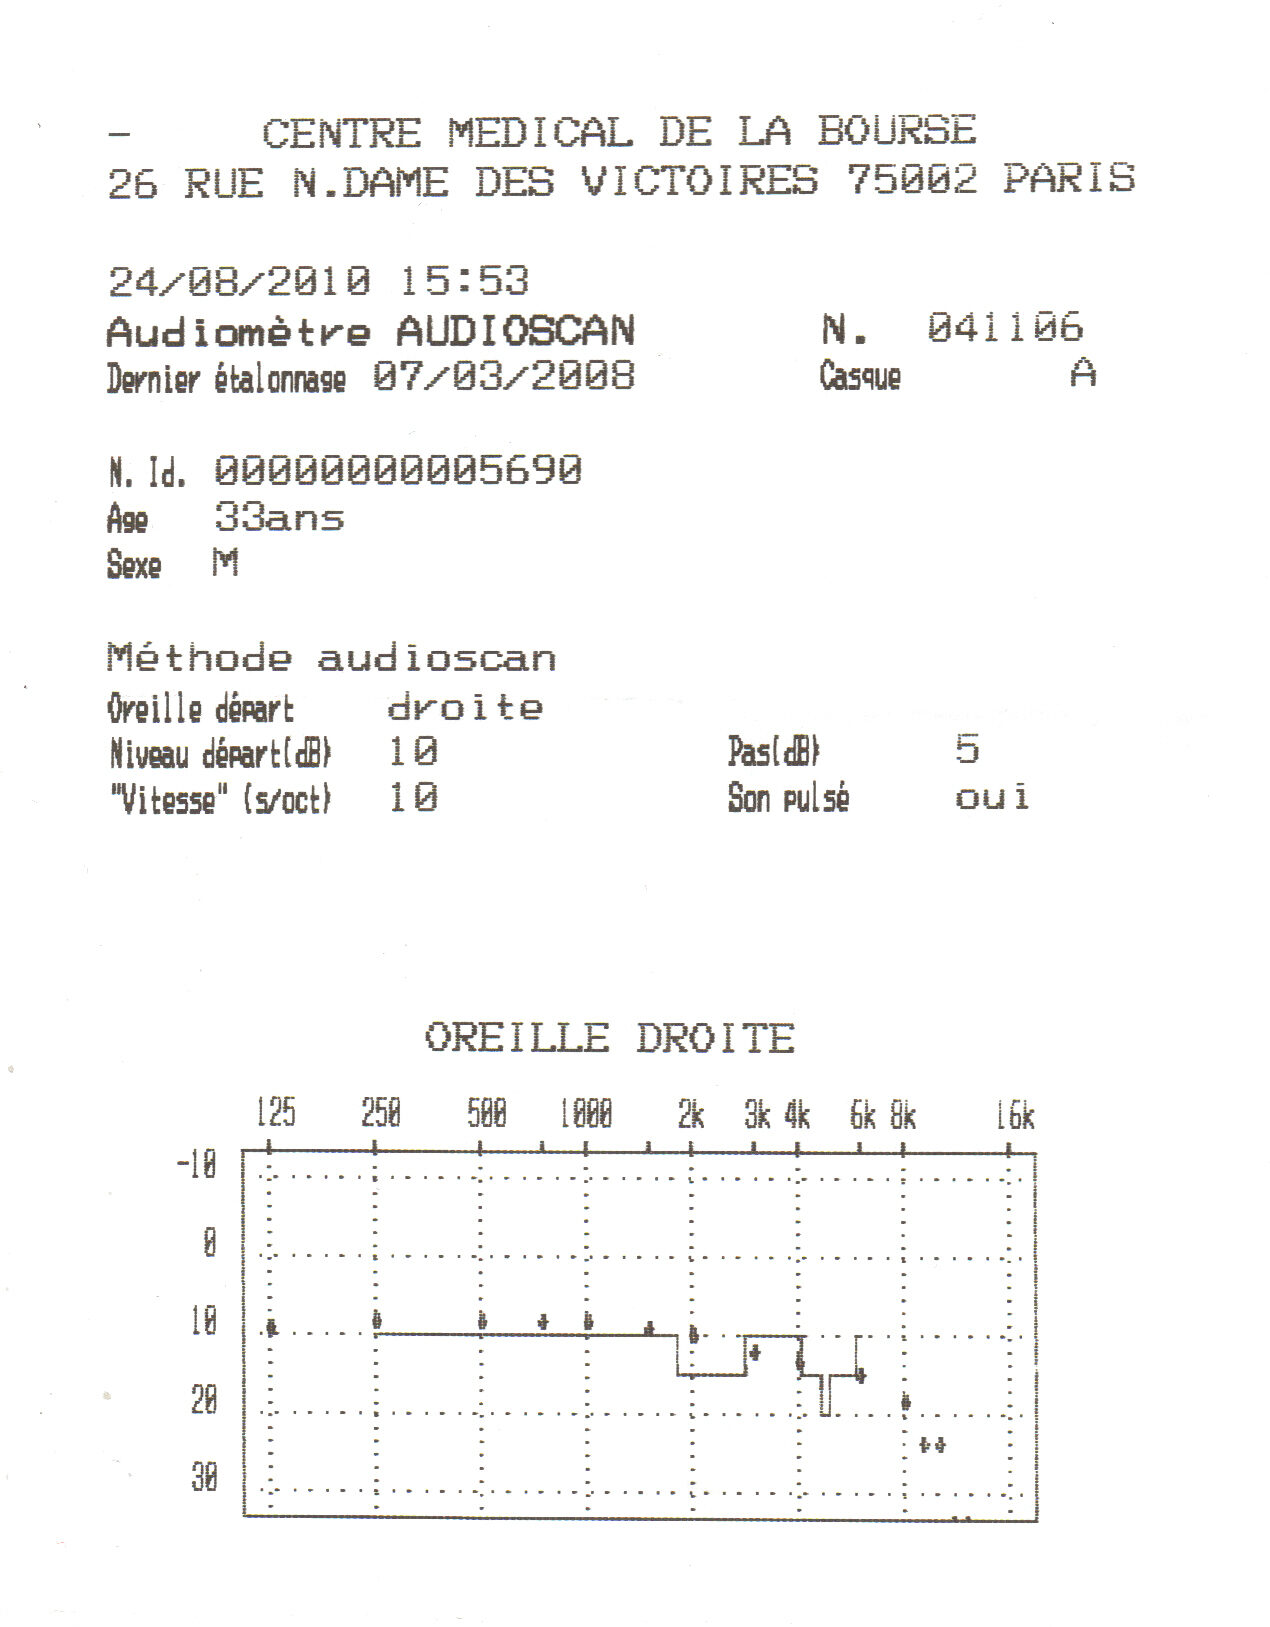 audiometrie-oreille-droite-2816022